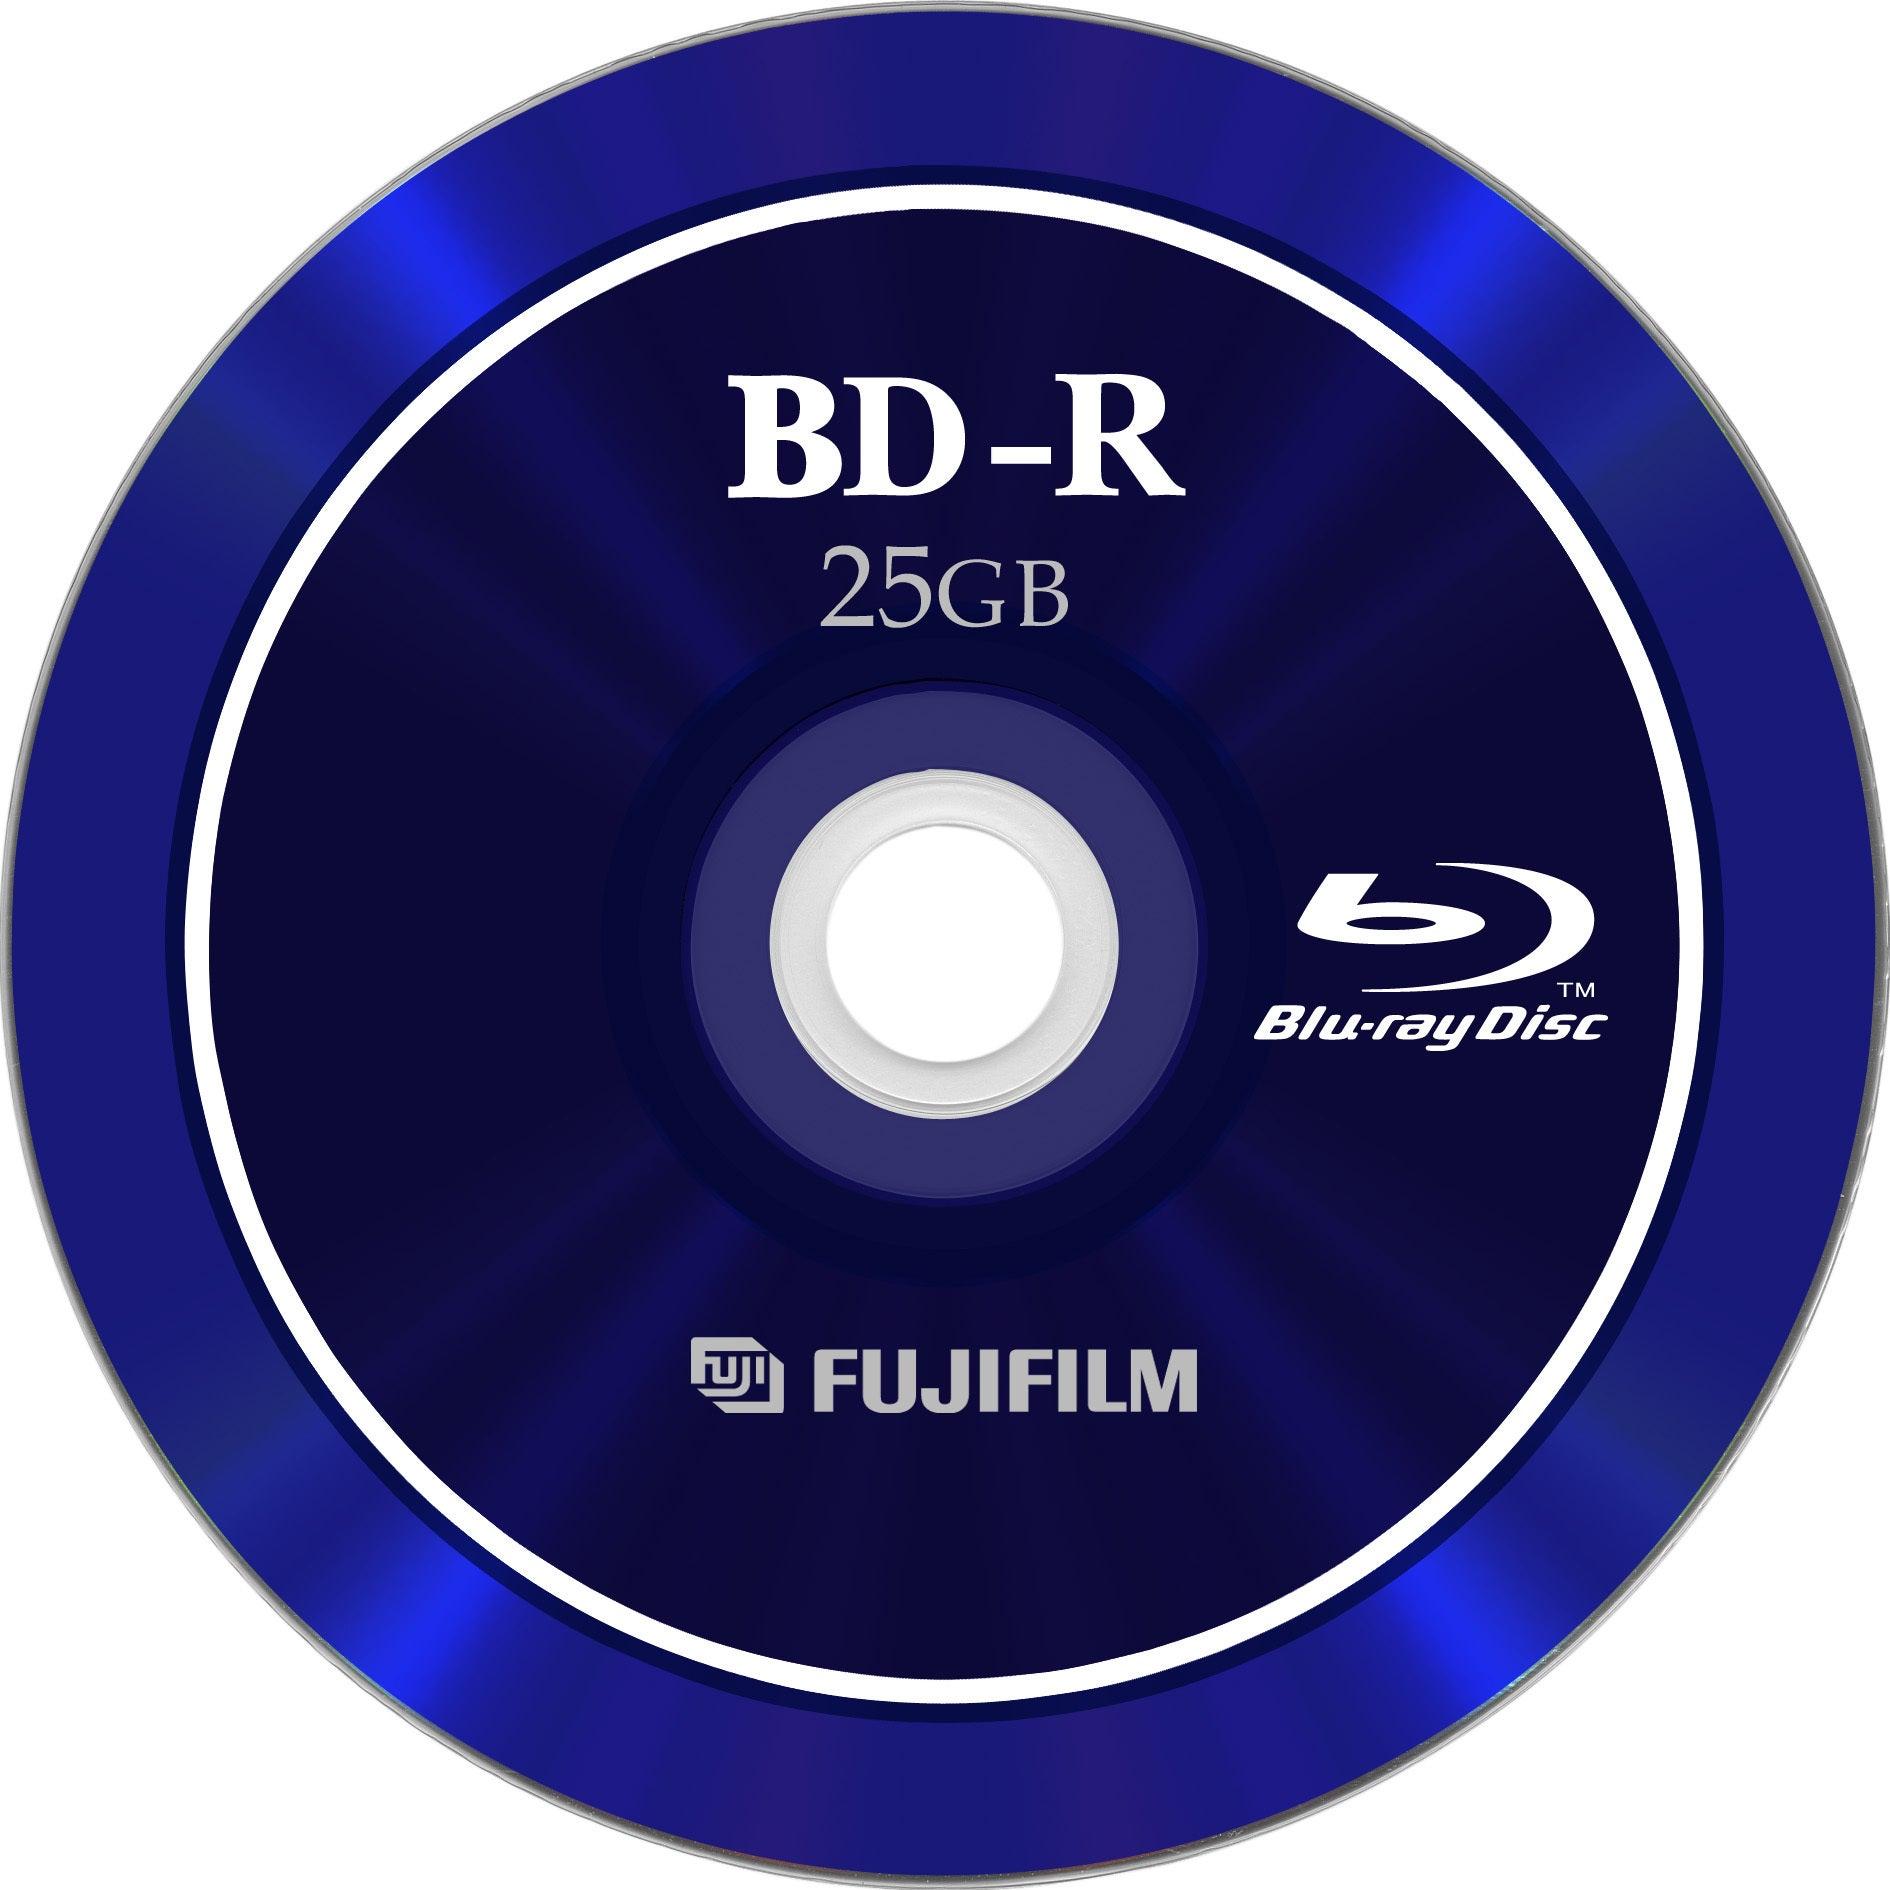 Fujifilm Launches Blu-ray Media